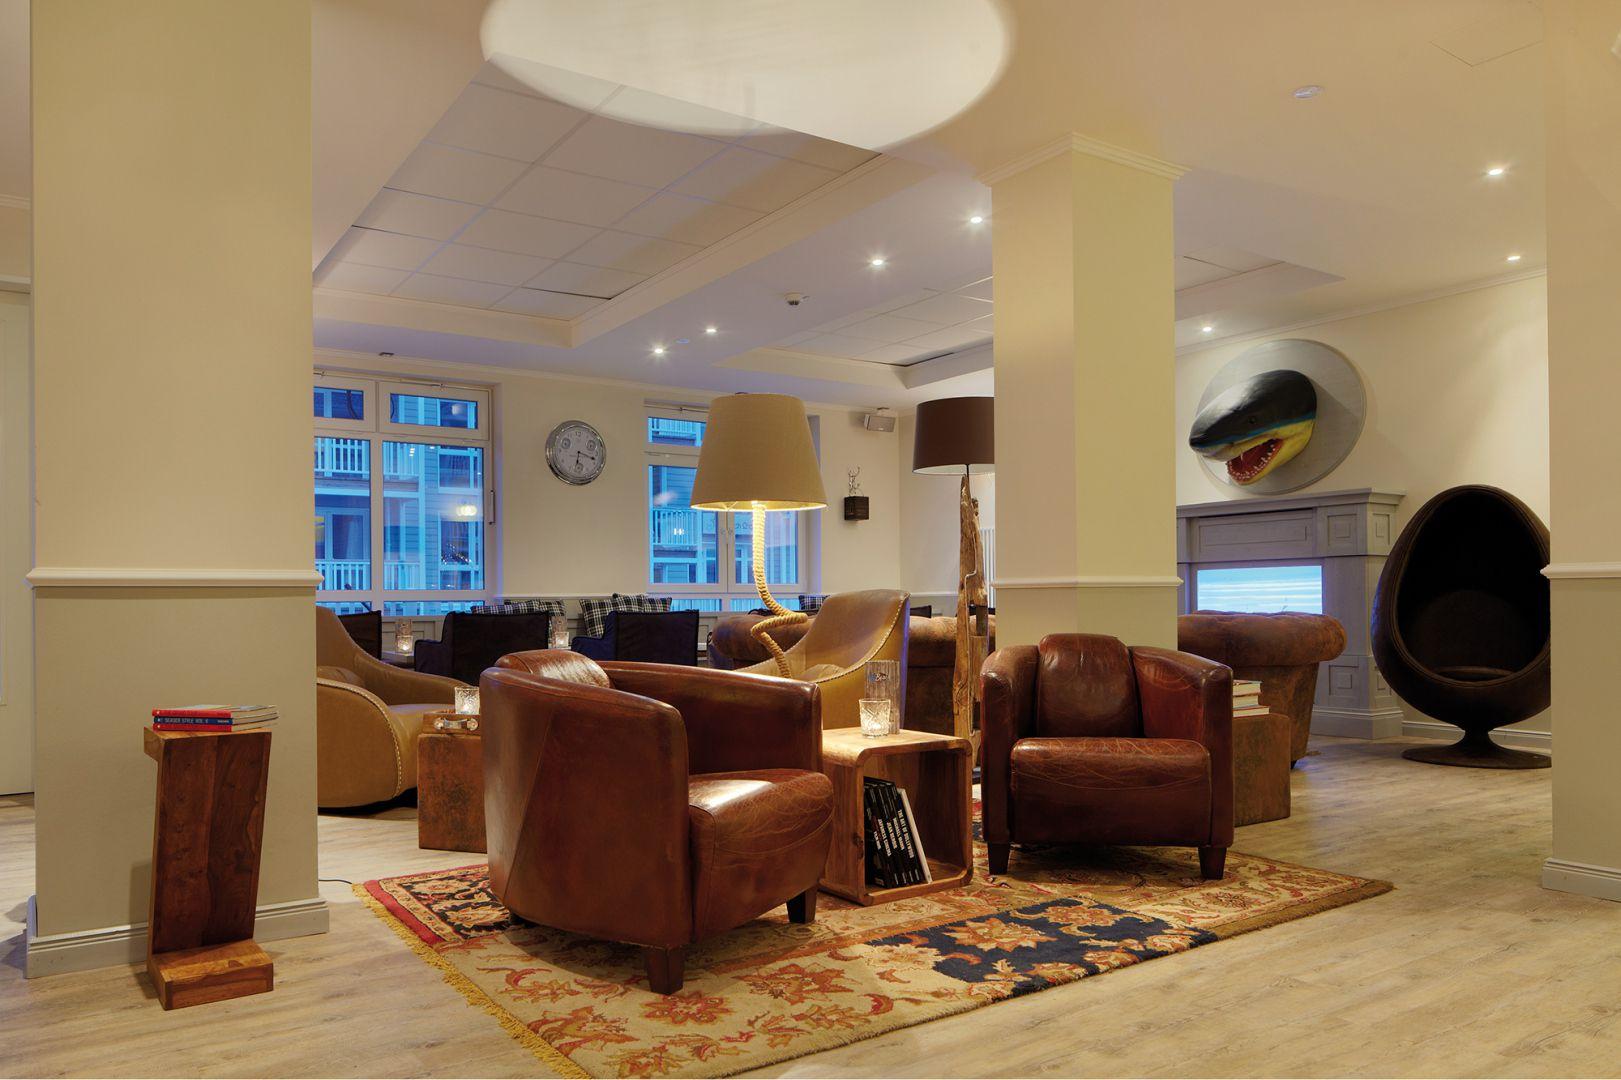 extras beach motel st peter ording. Black Bedroom Furniture Sets. Home Design Ideas